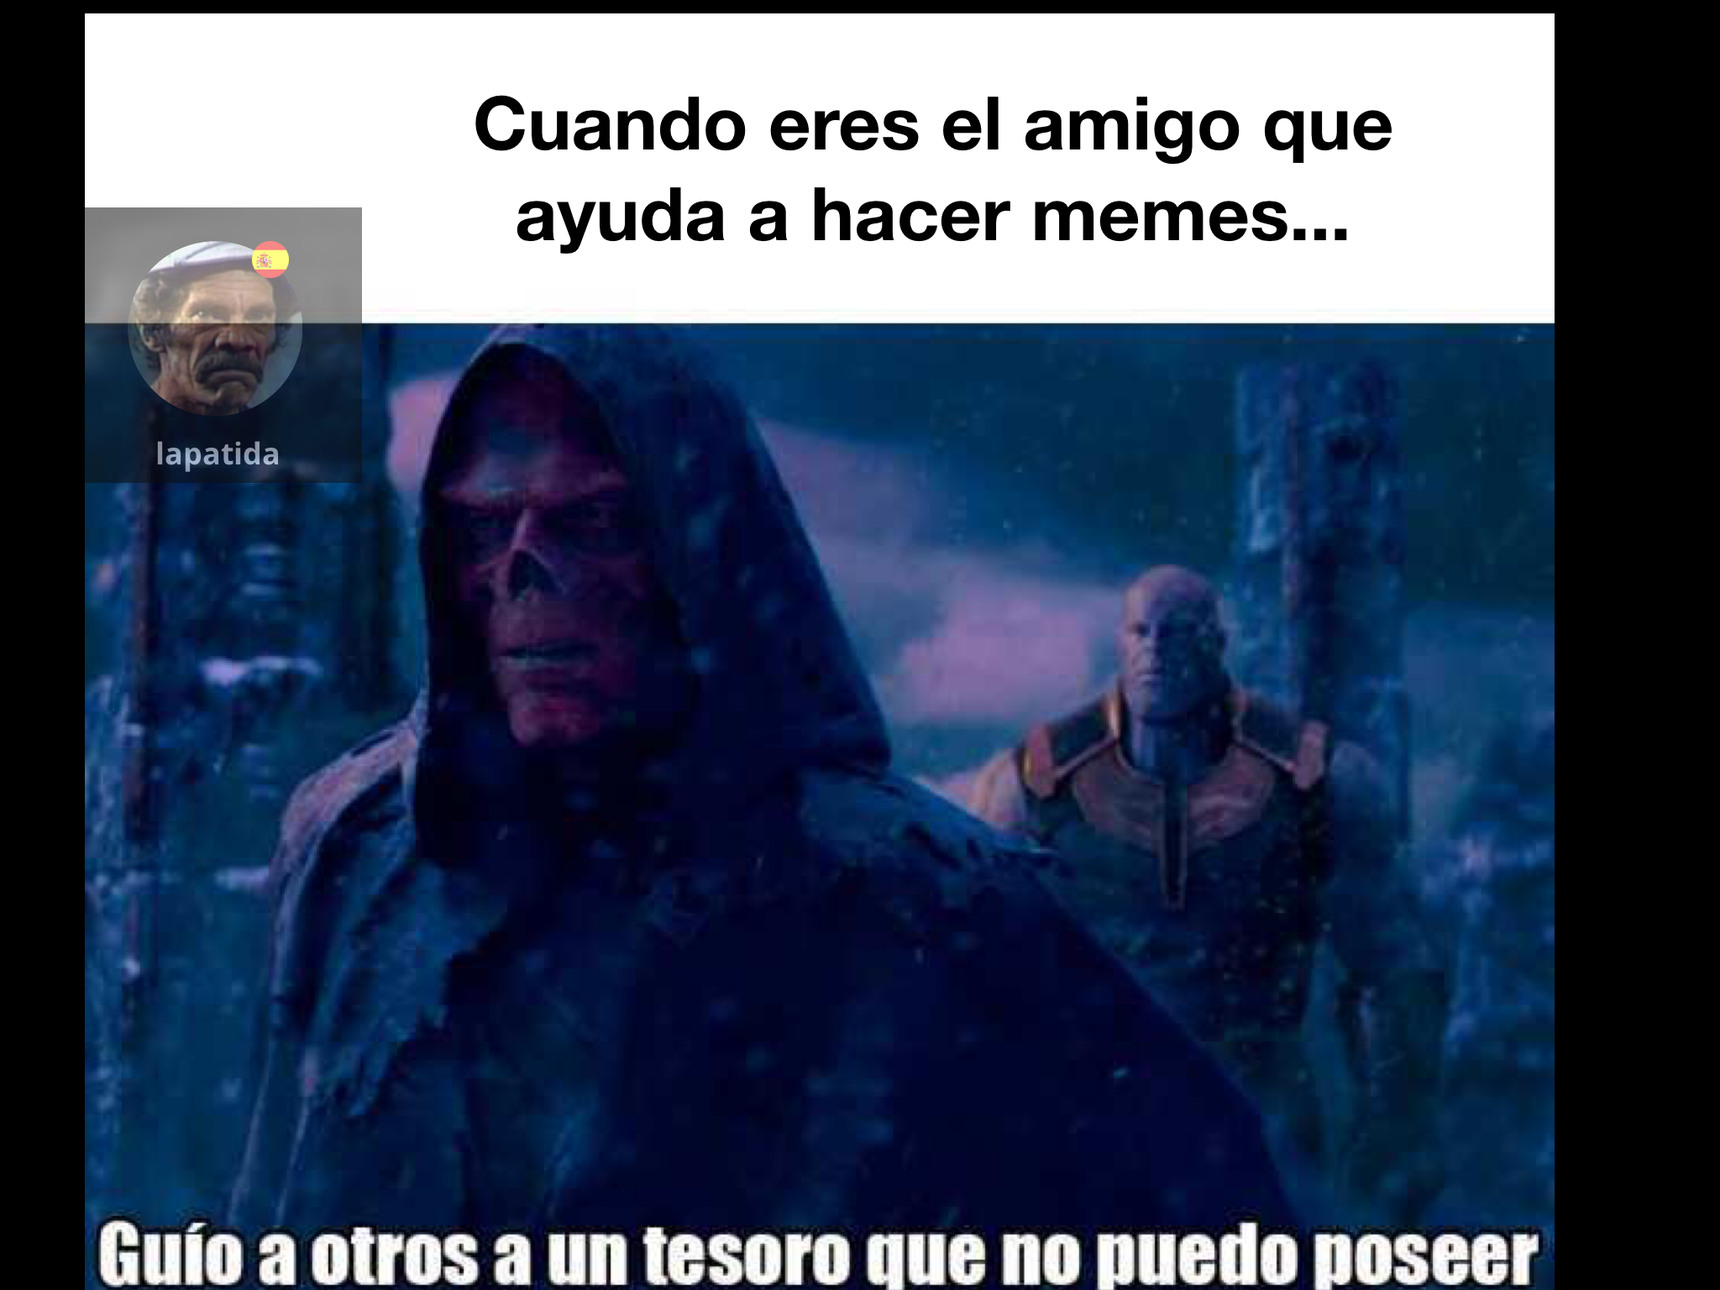 Viva los amigos - meme